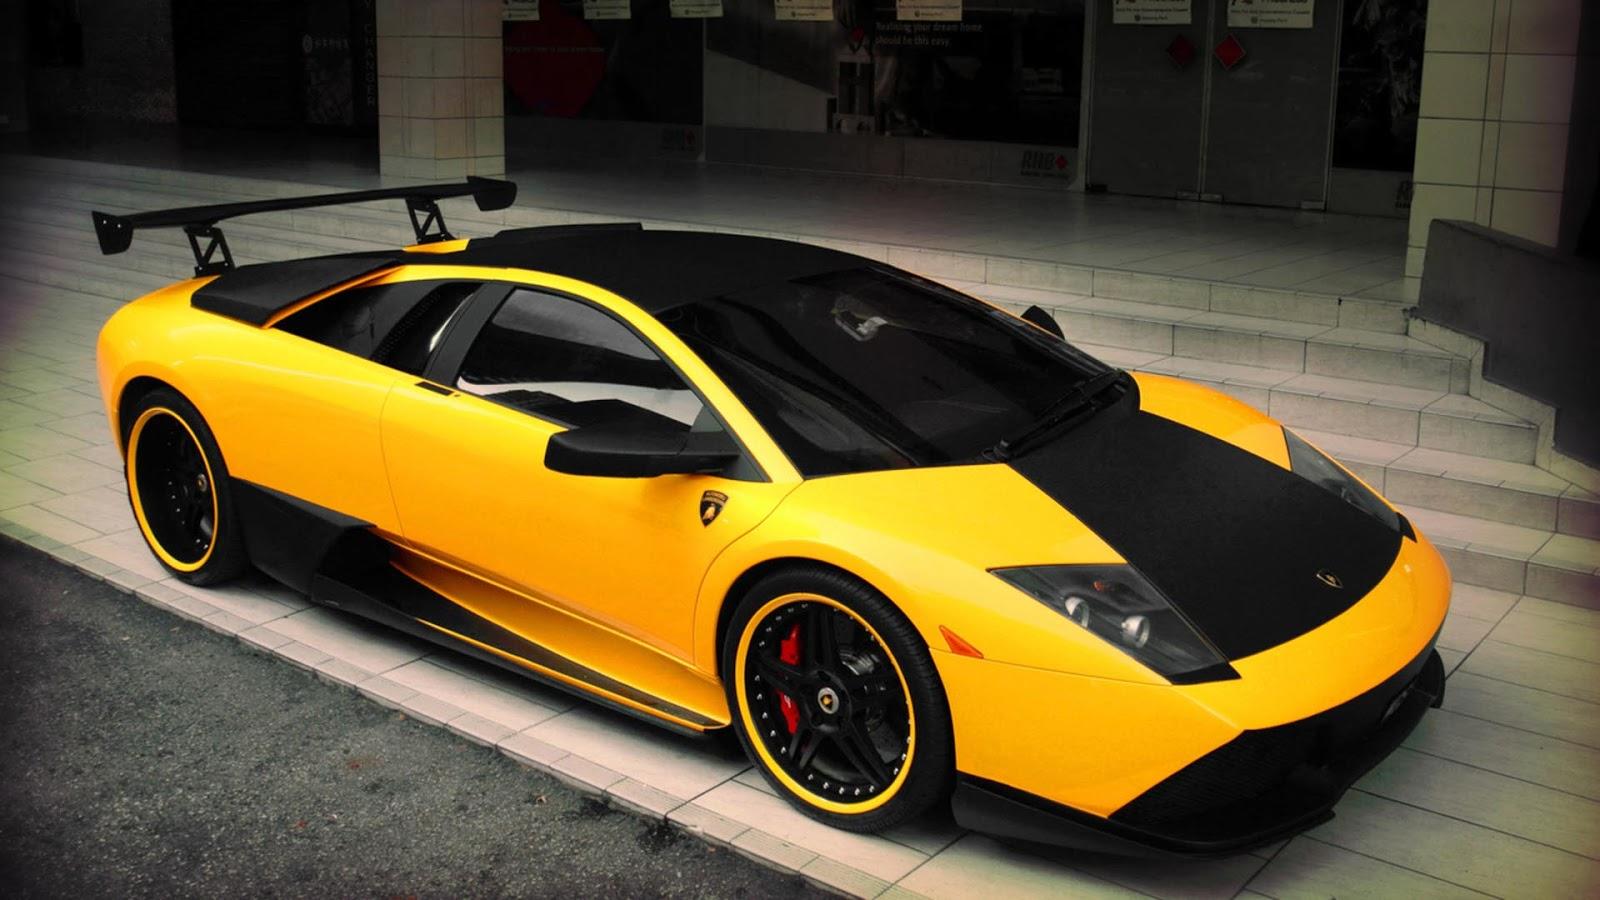 Yellow Lamborghini Cars Pictures